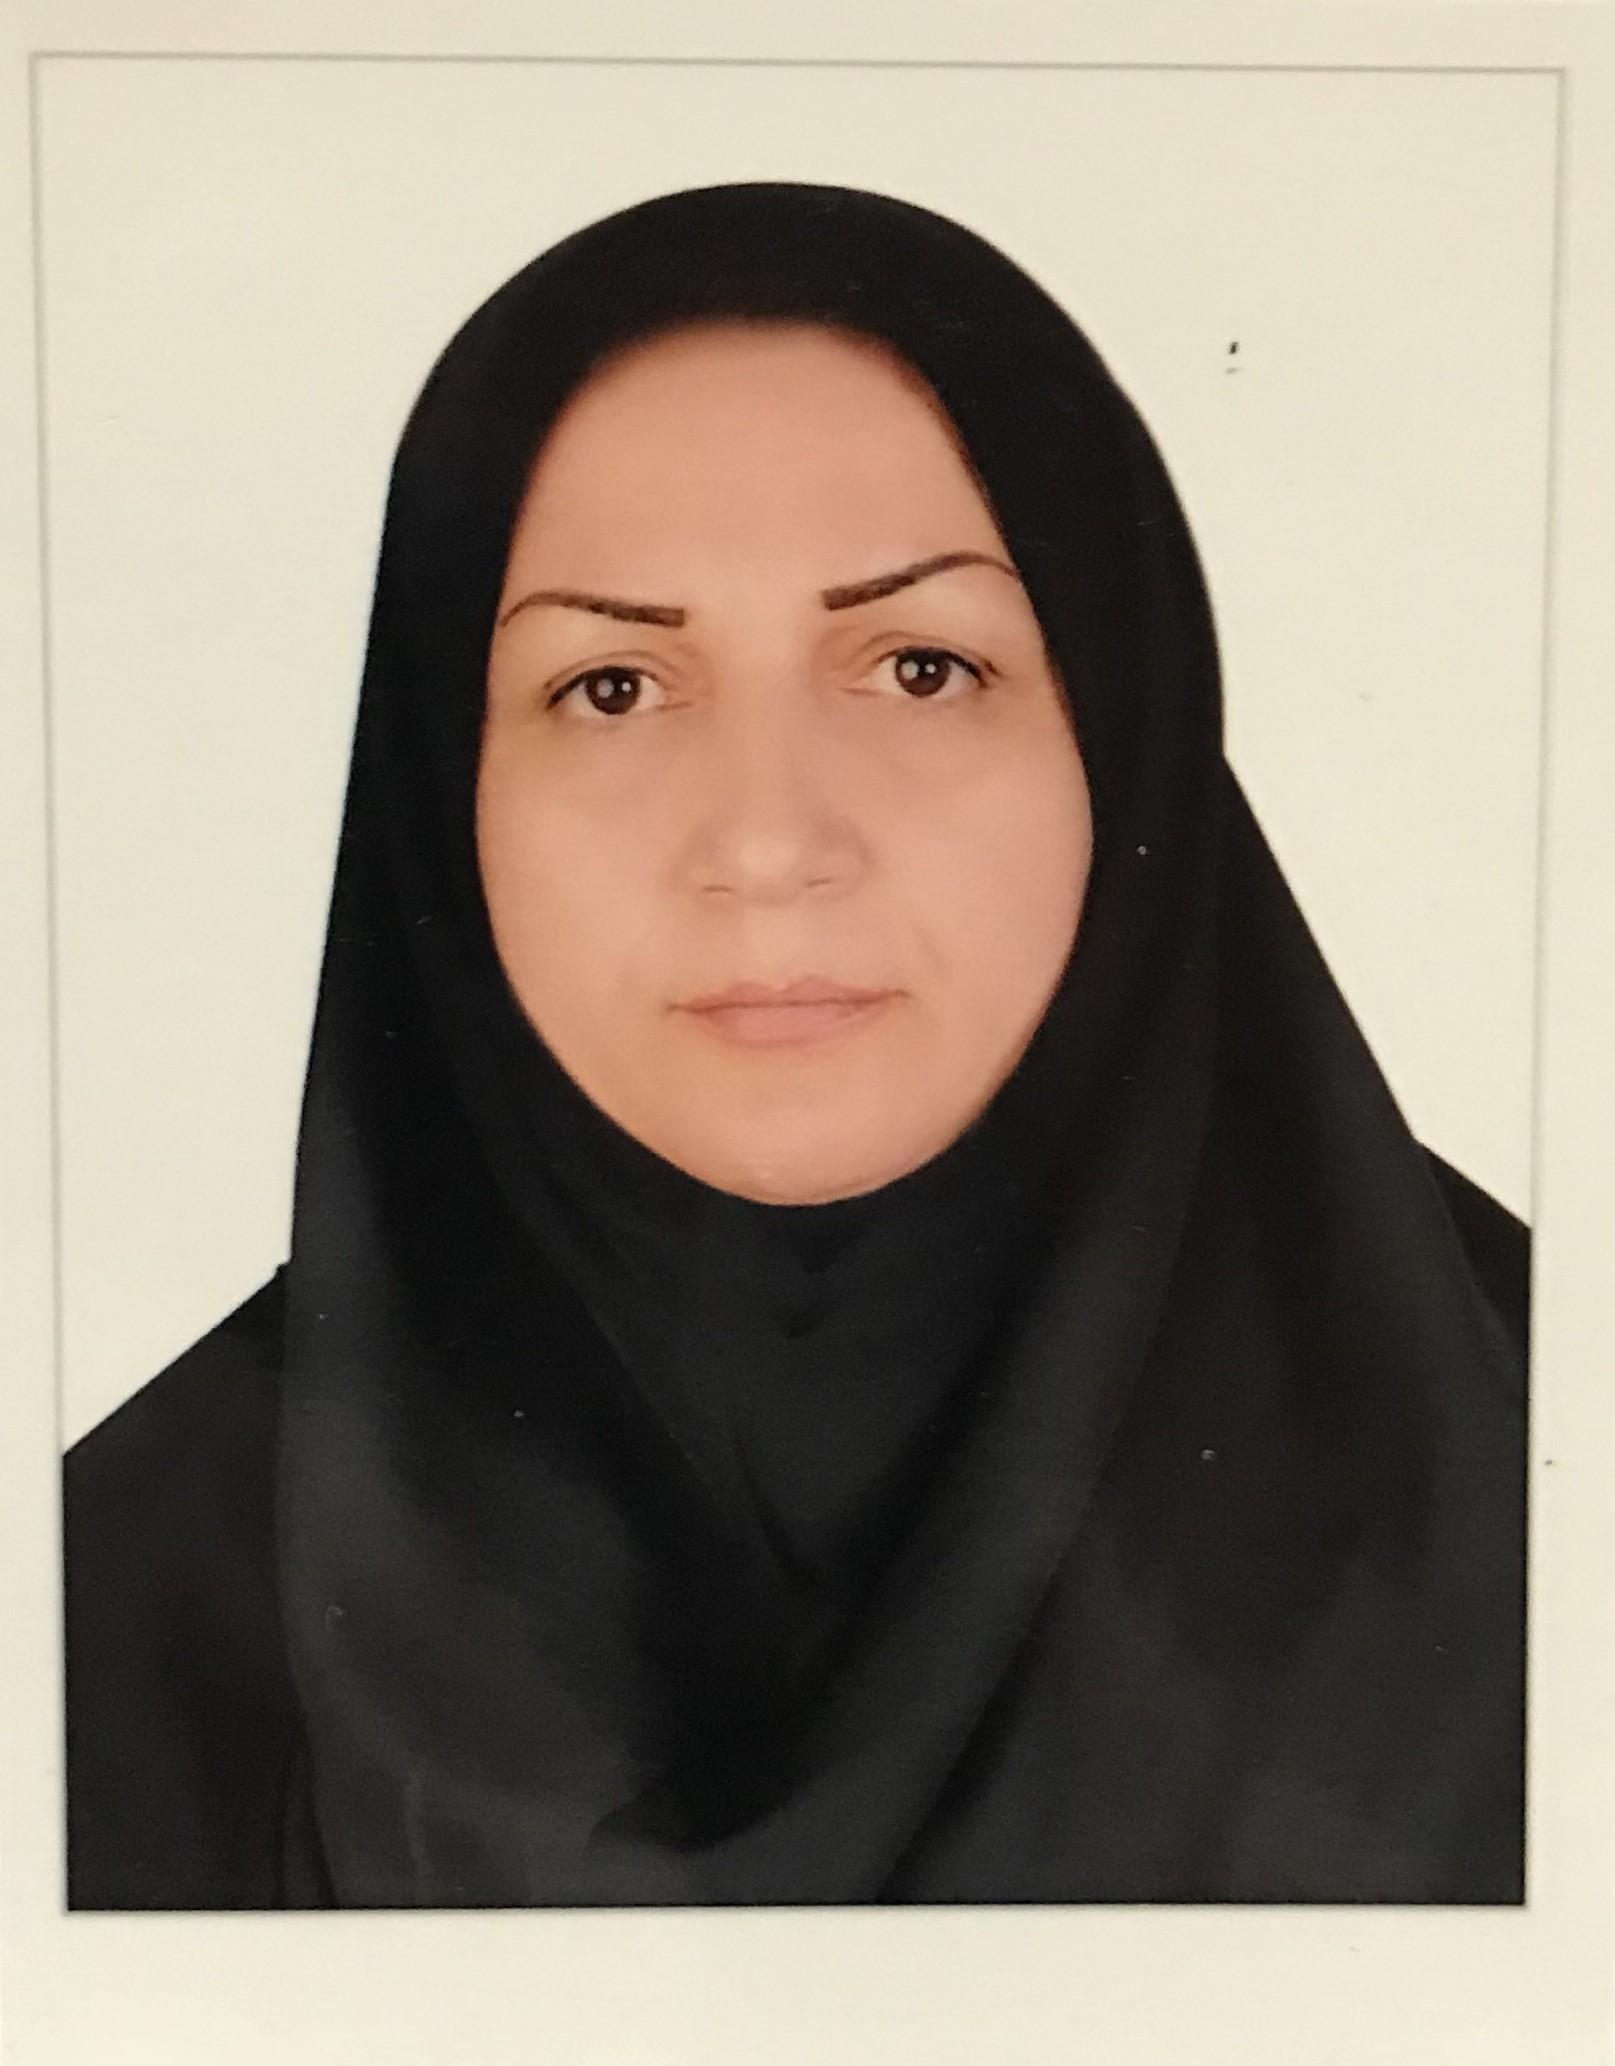 زهرا اسدپور مدیر فروش